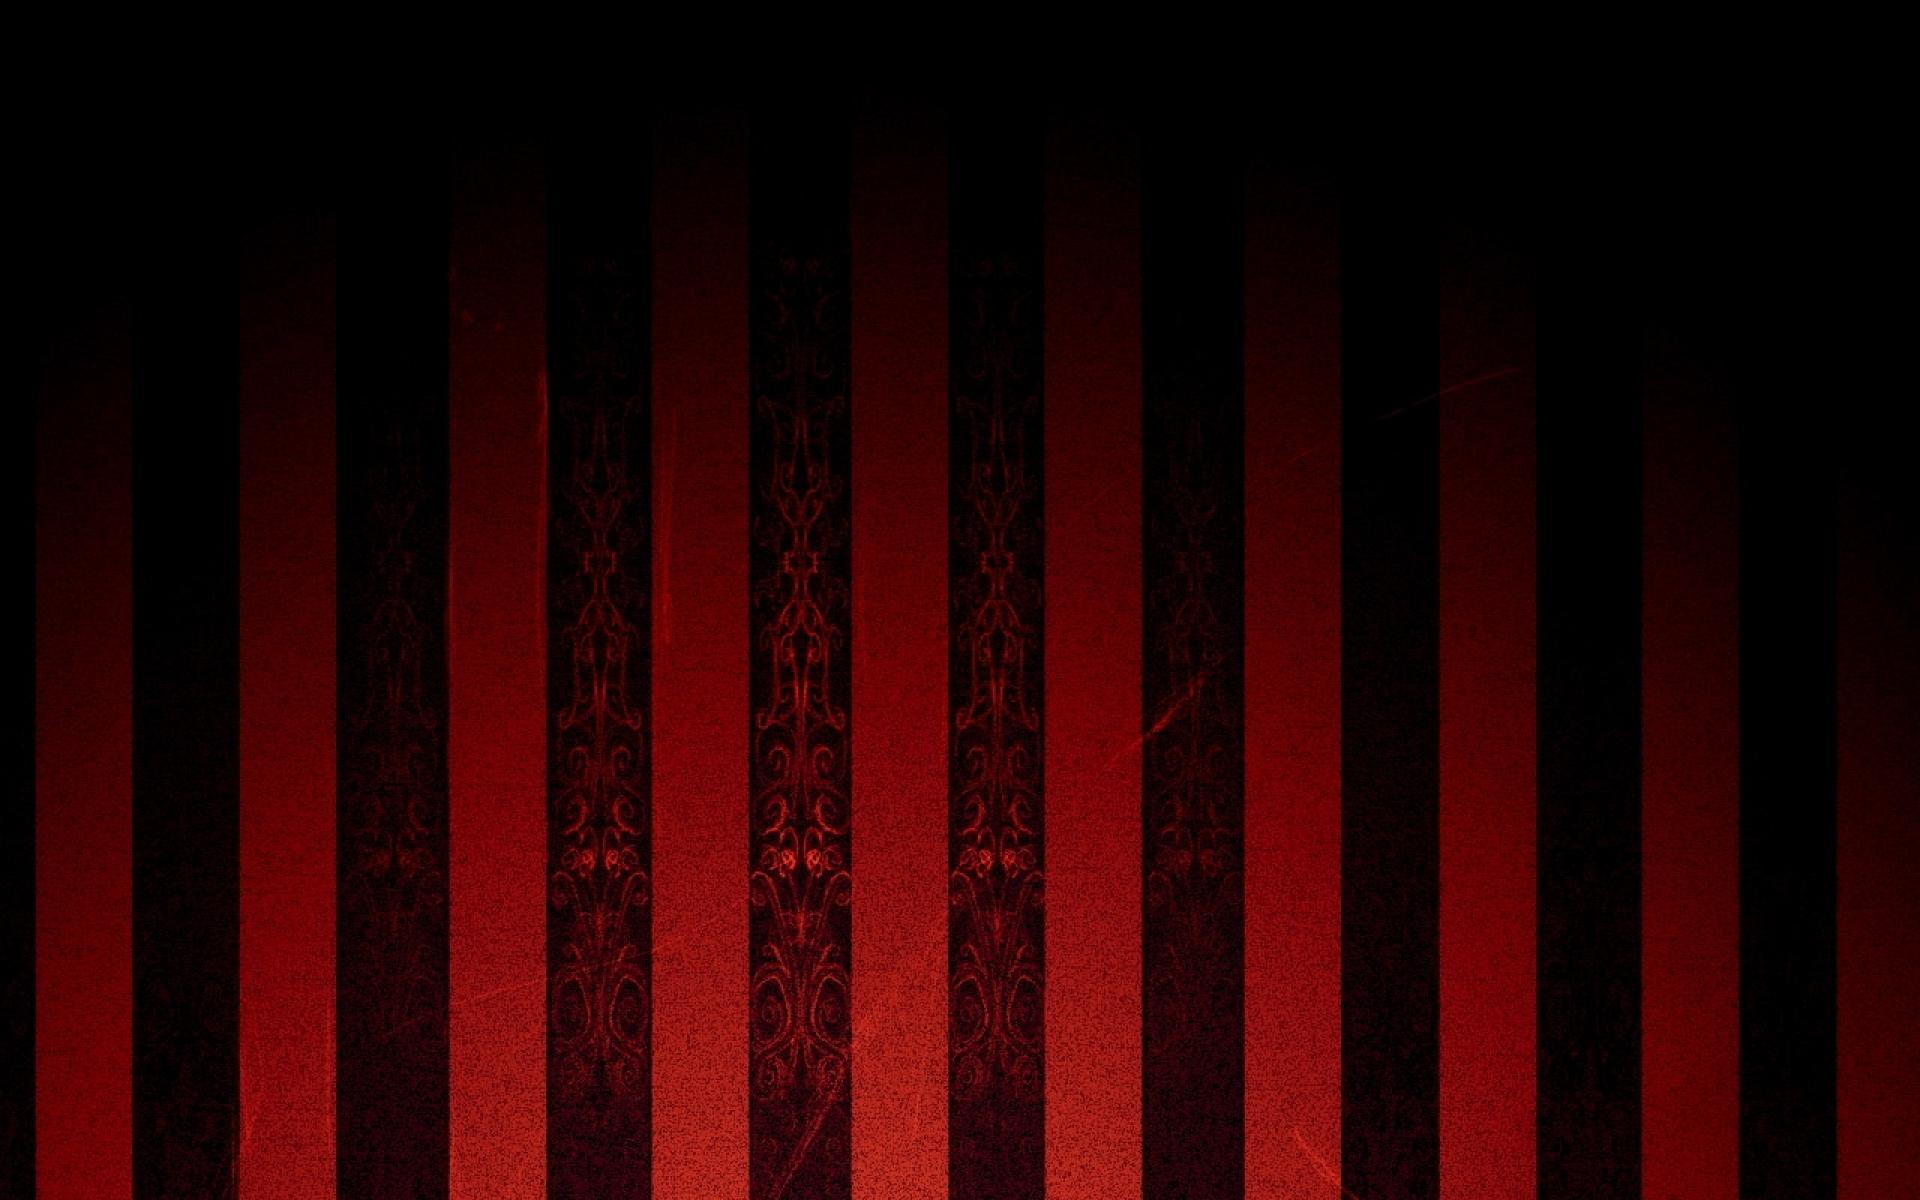 Black Red hd wallpaper for desktop Full HD Wallpapers Points 1920x1200